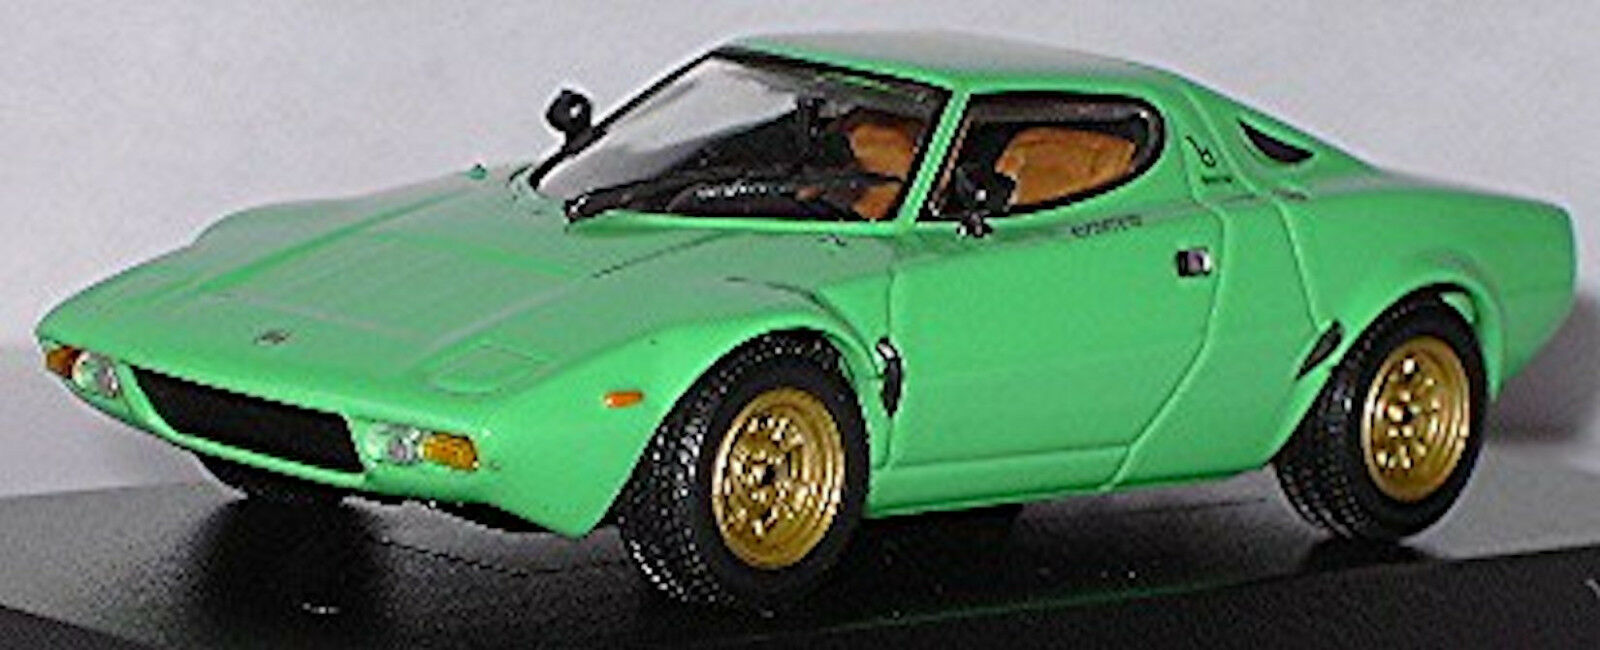 Lancia Stratos HF Stradale Coupé 1974 verde 1 43 Minichamps